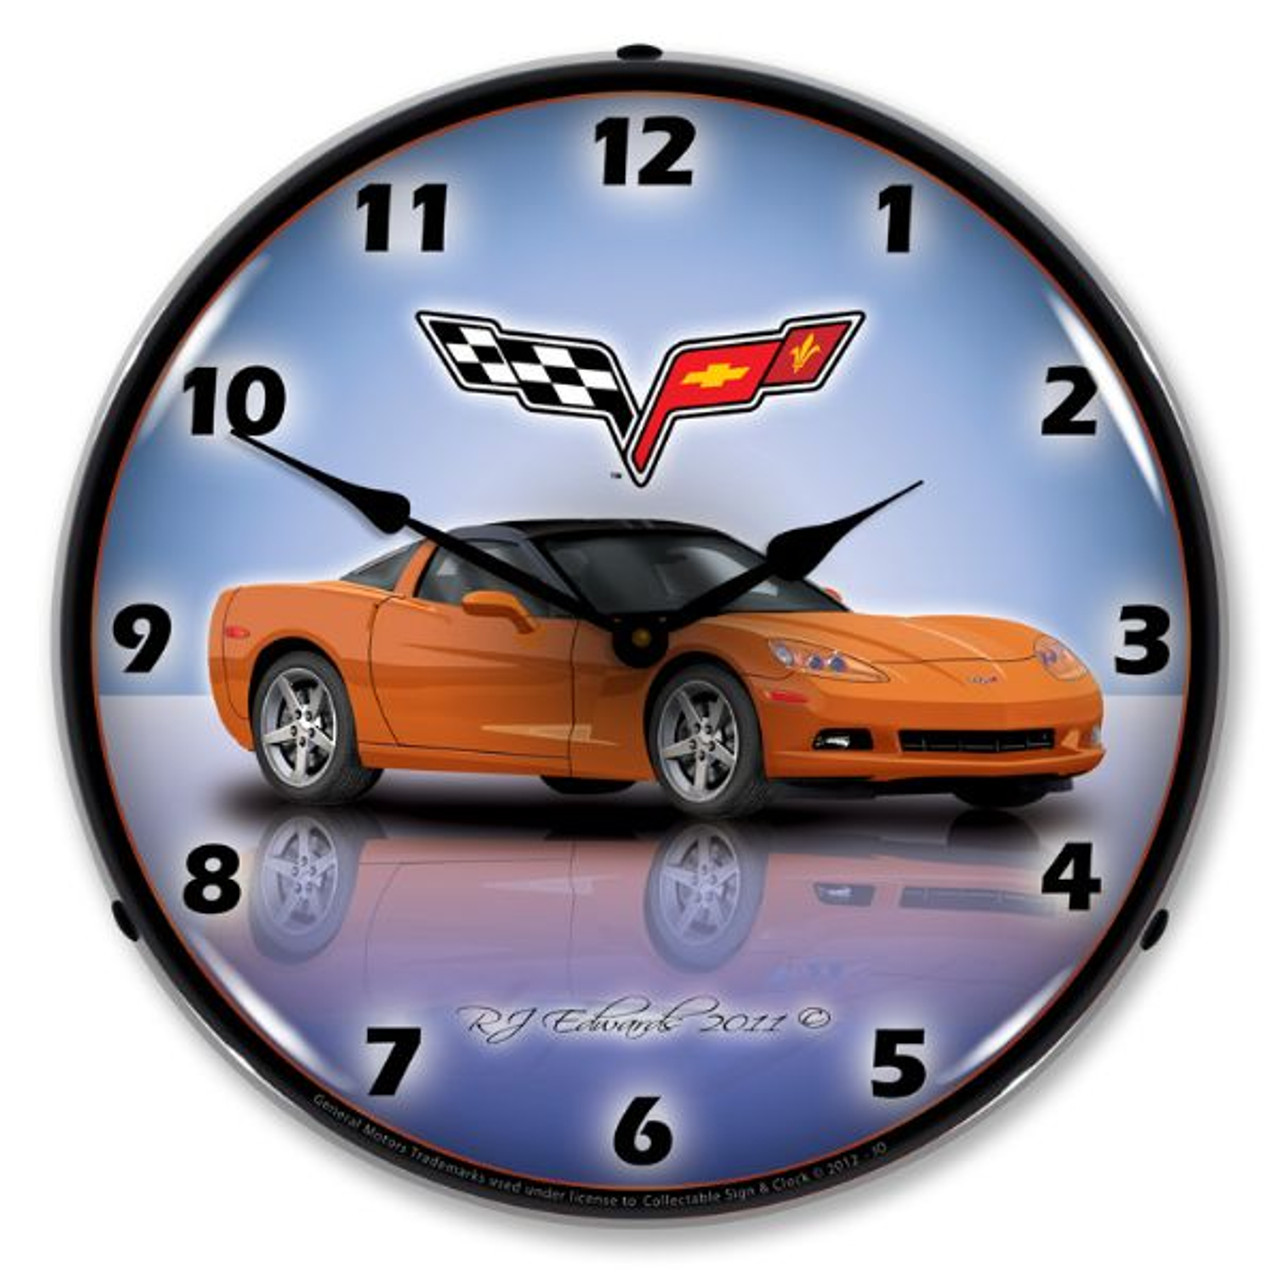 C6 Corvette Inferno Orange Lighted Wall Clock 14 x 14 Inches